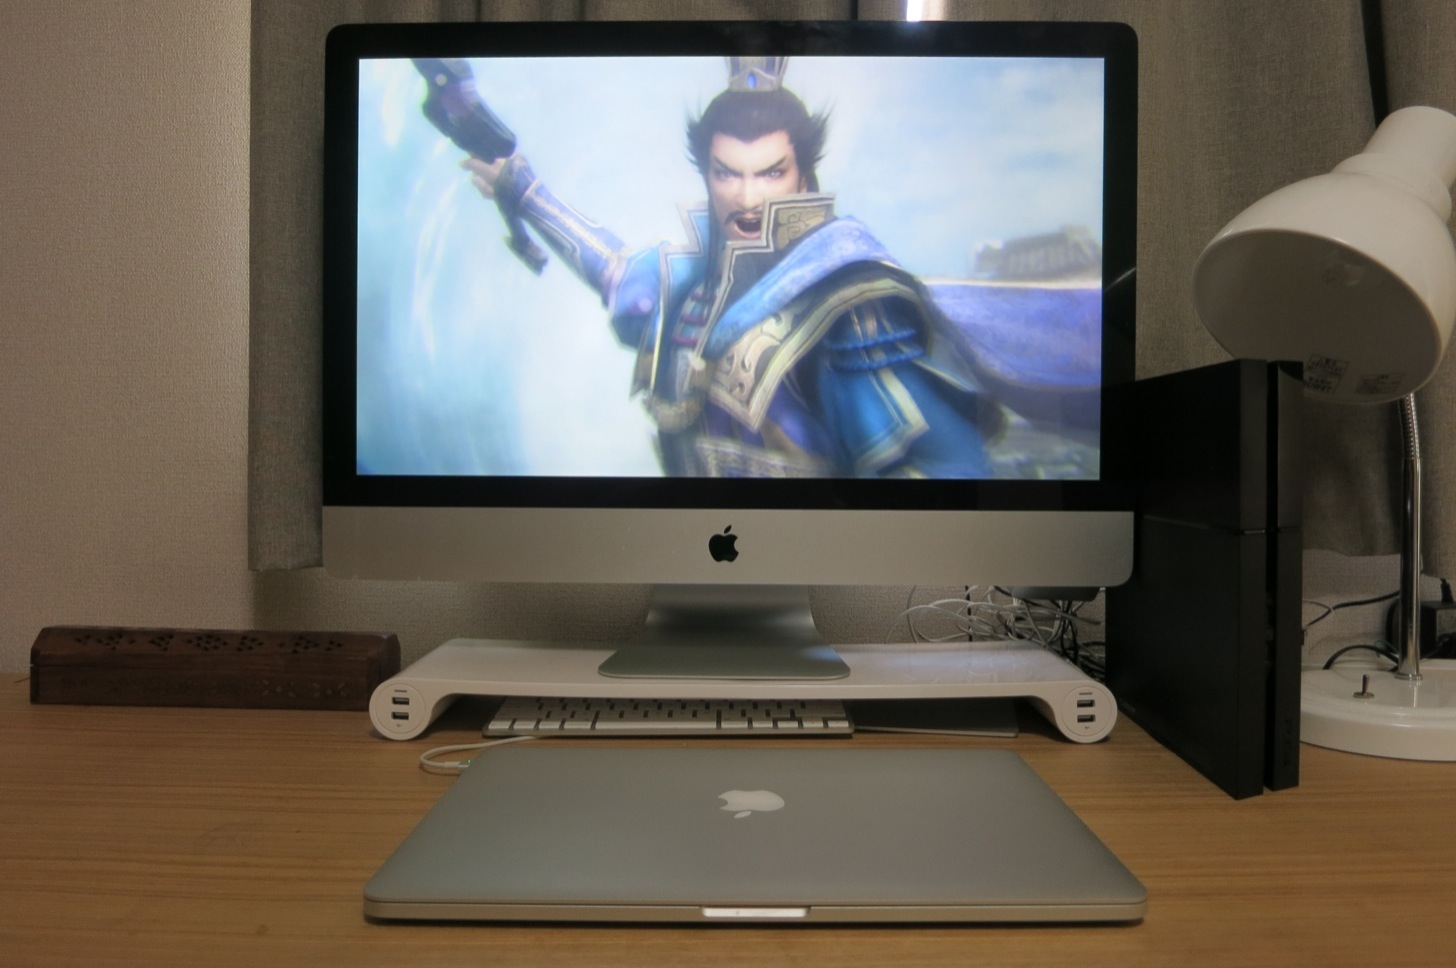 PS4のゲーム真三國無双7がiMac上で動いている!